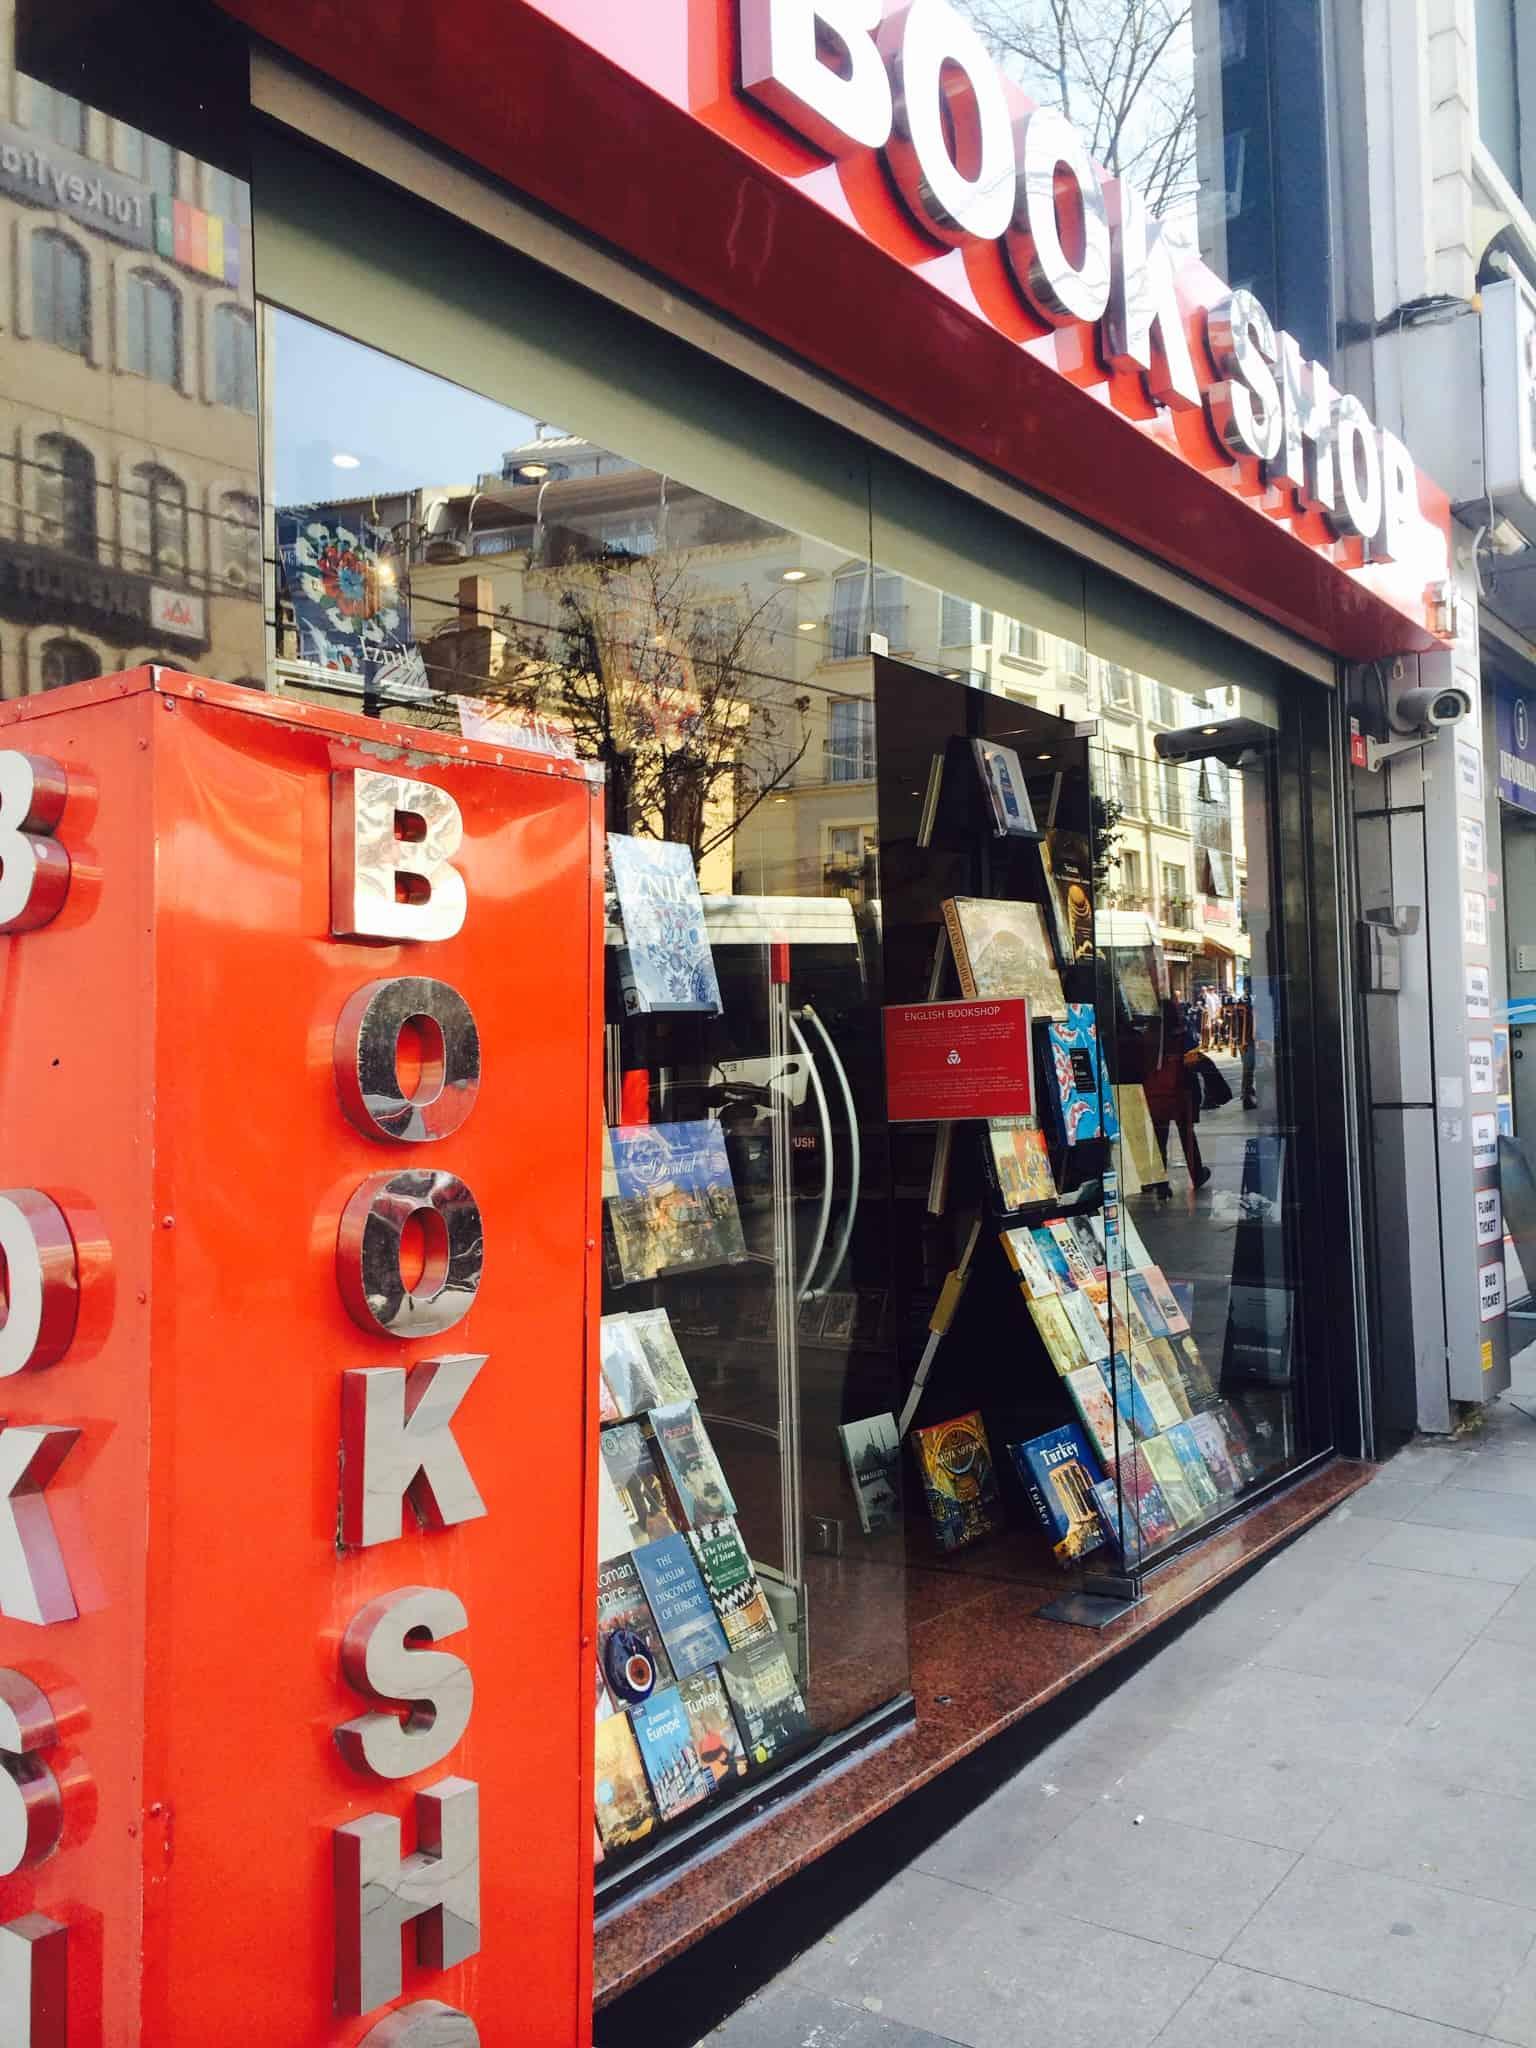 Galeri Kayseri English Bookshop